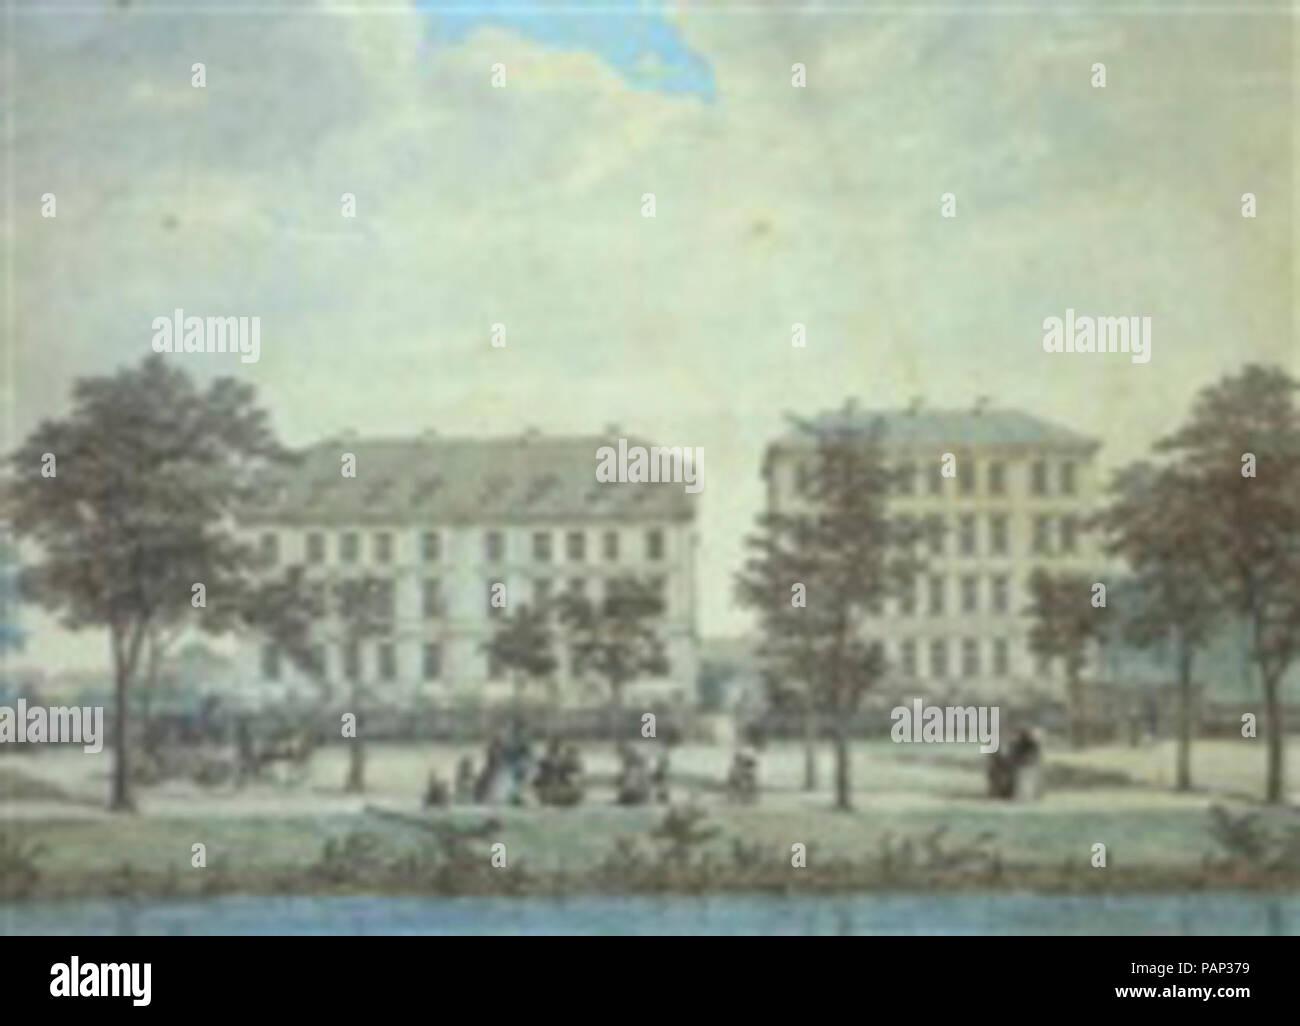 A Søerne. - Stock Image